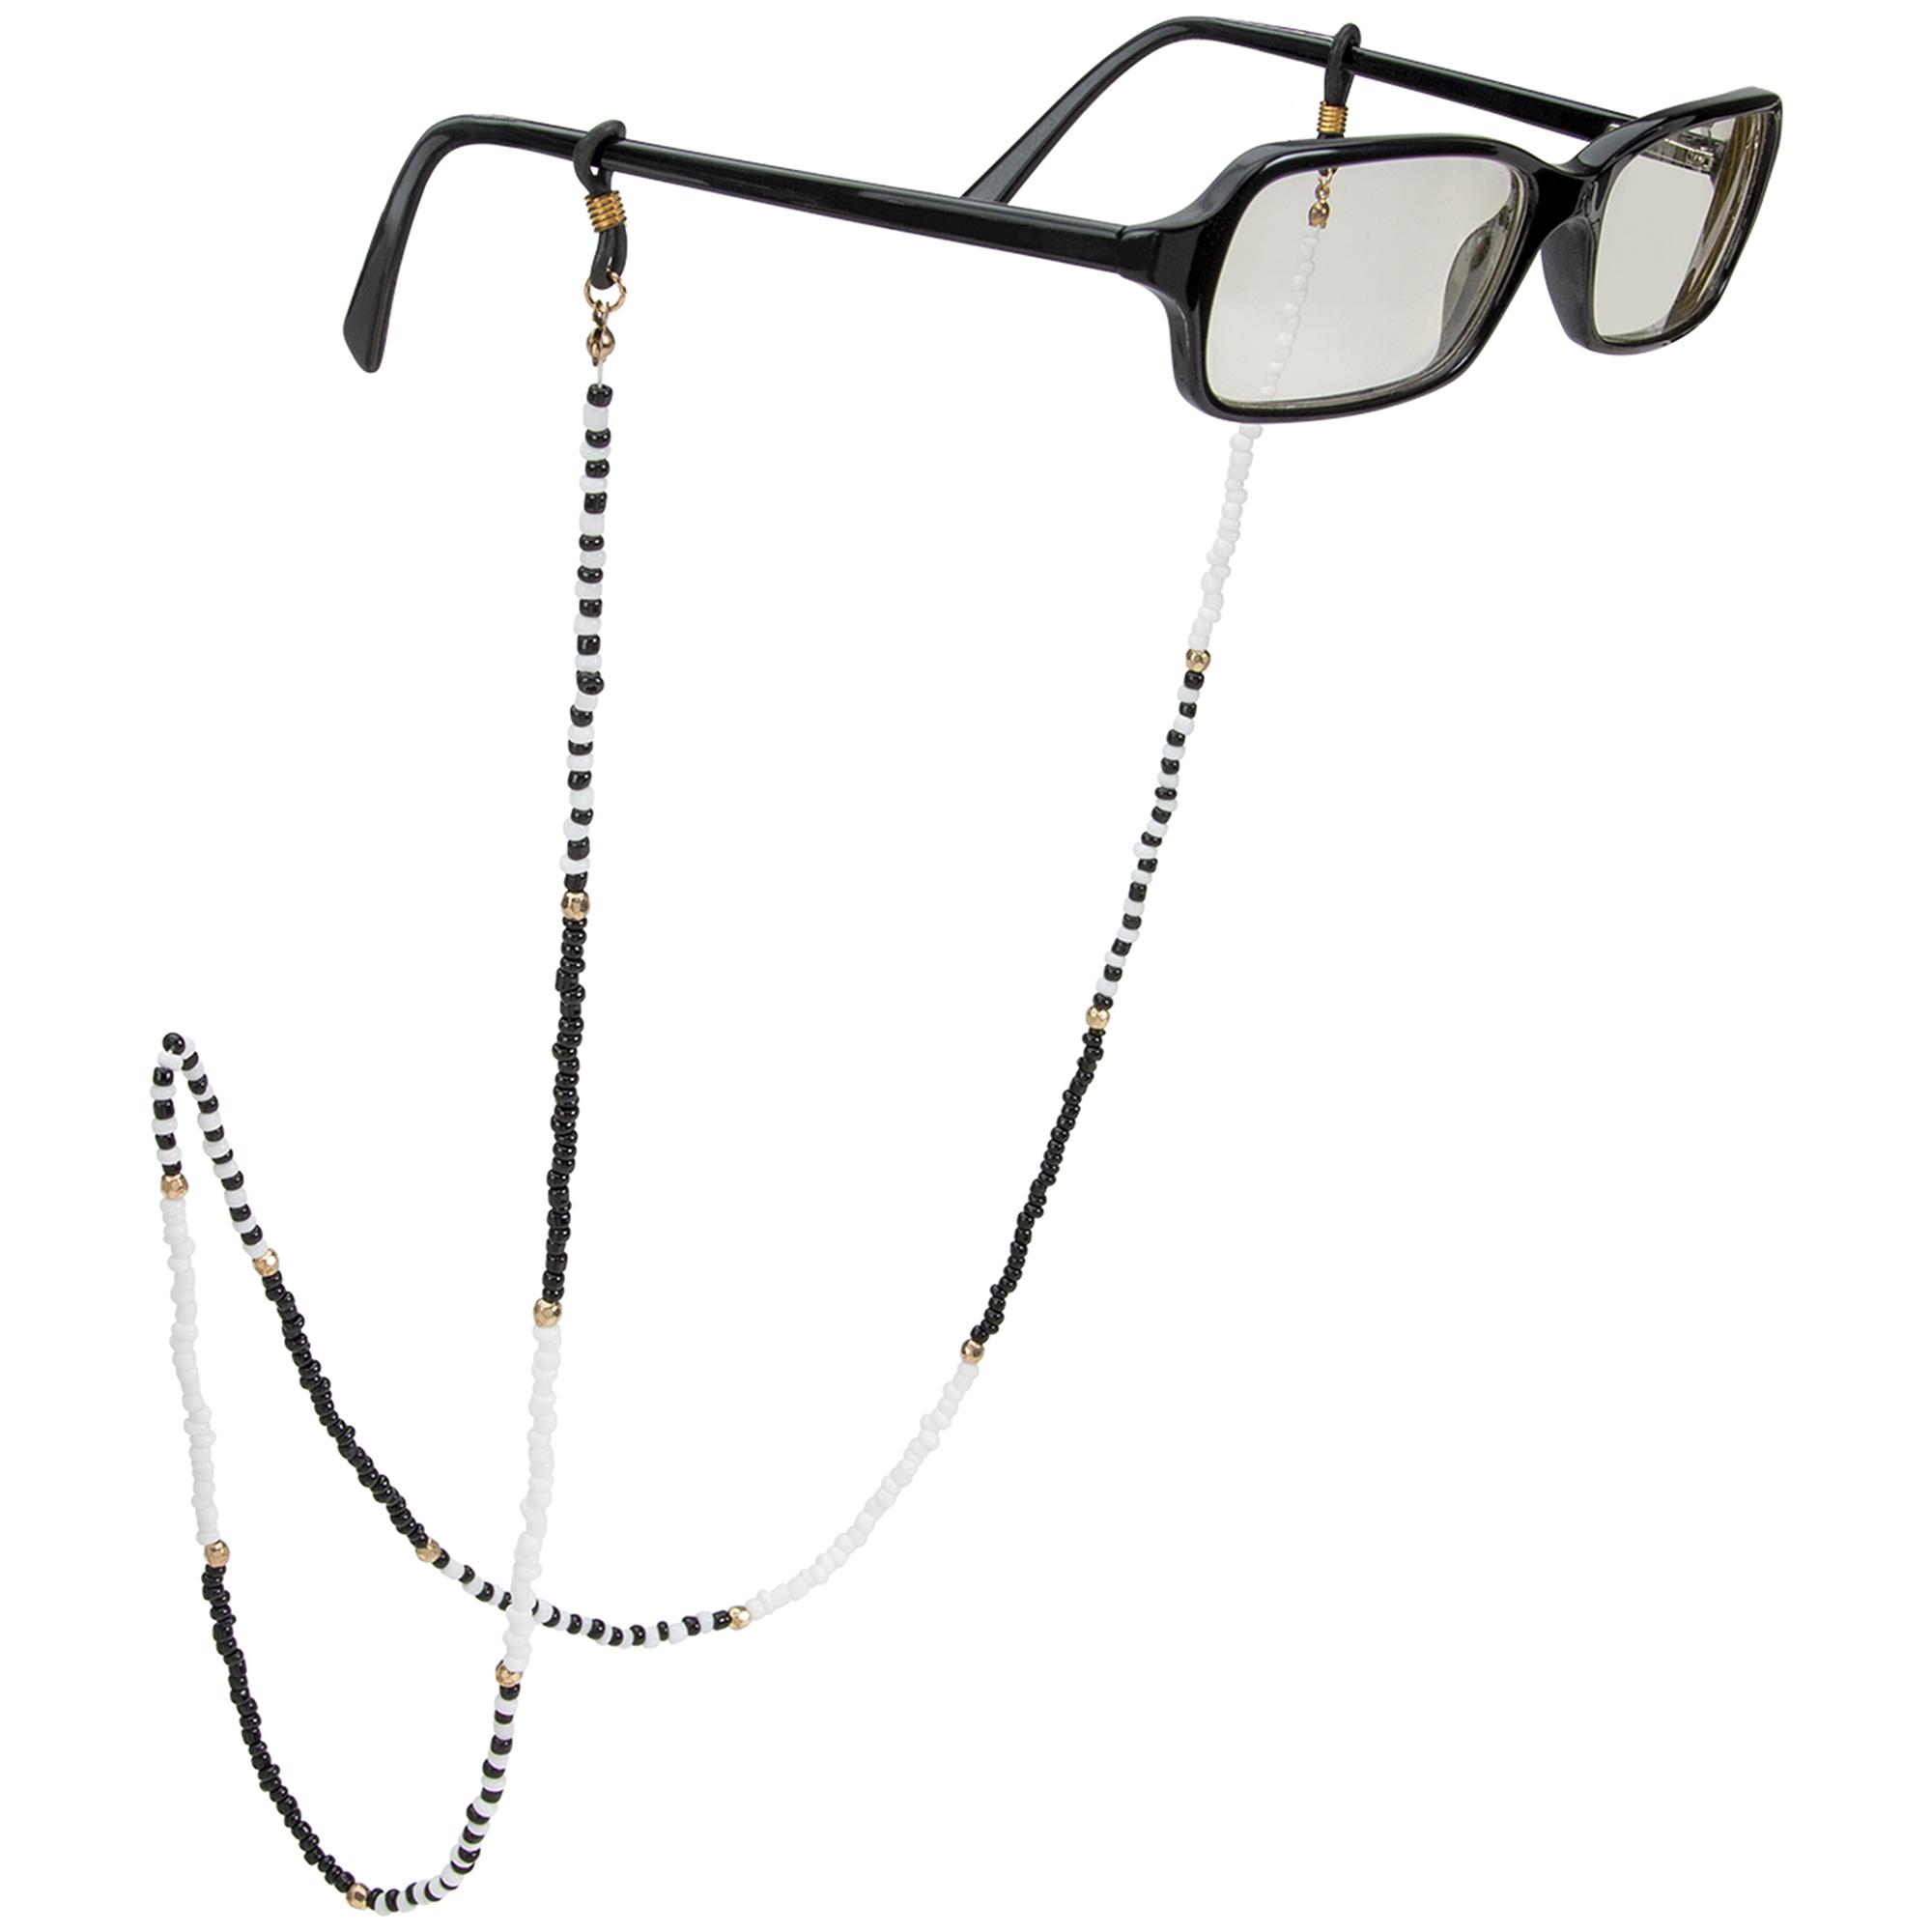 Black and White Beaded Eyeglass/Sunglass Retainer -Black/White - Front